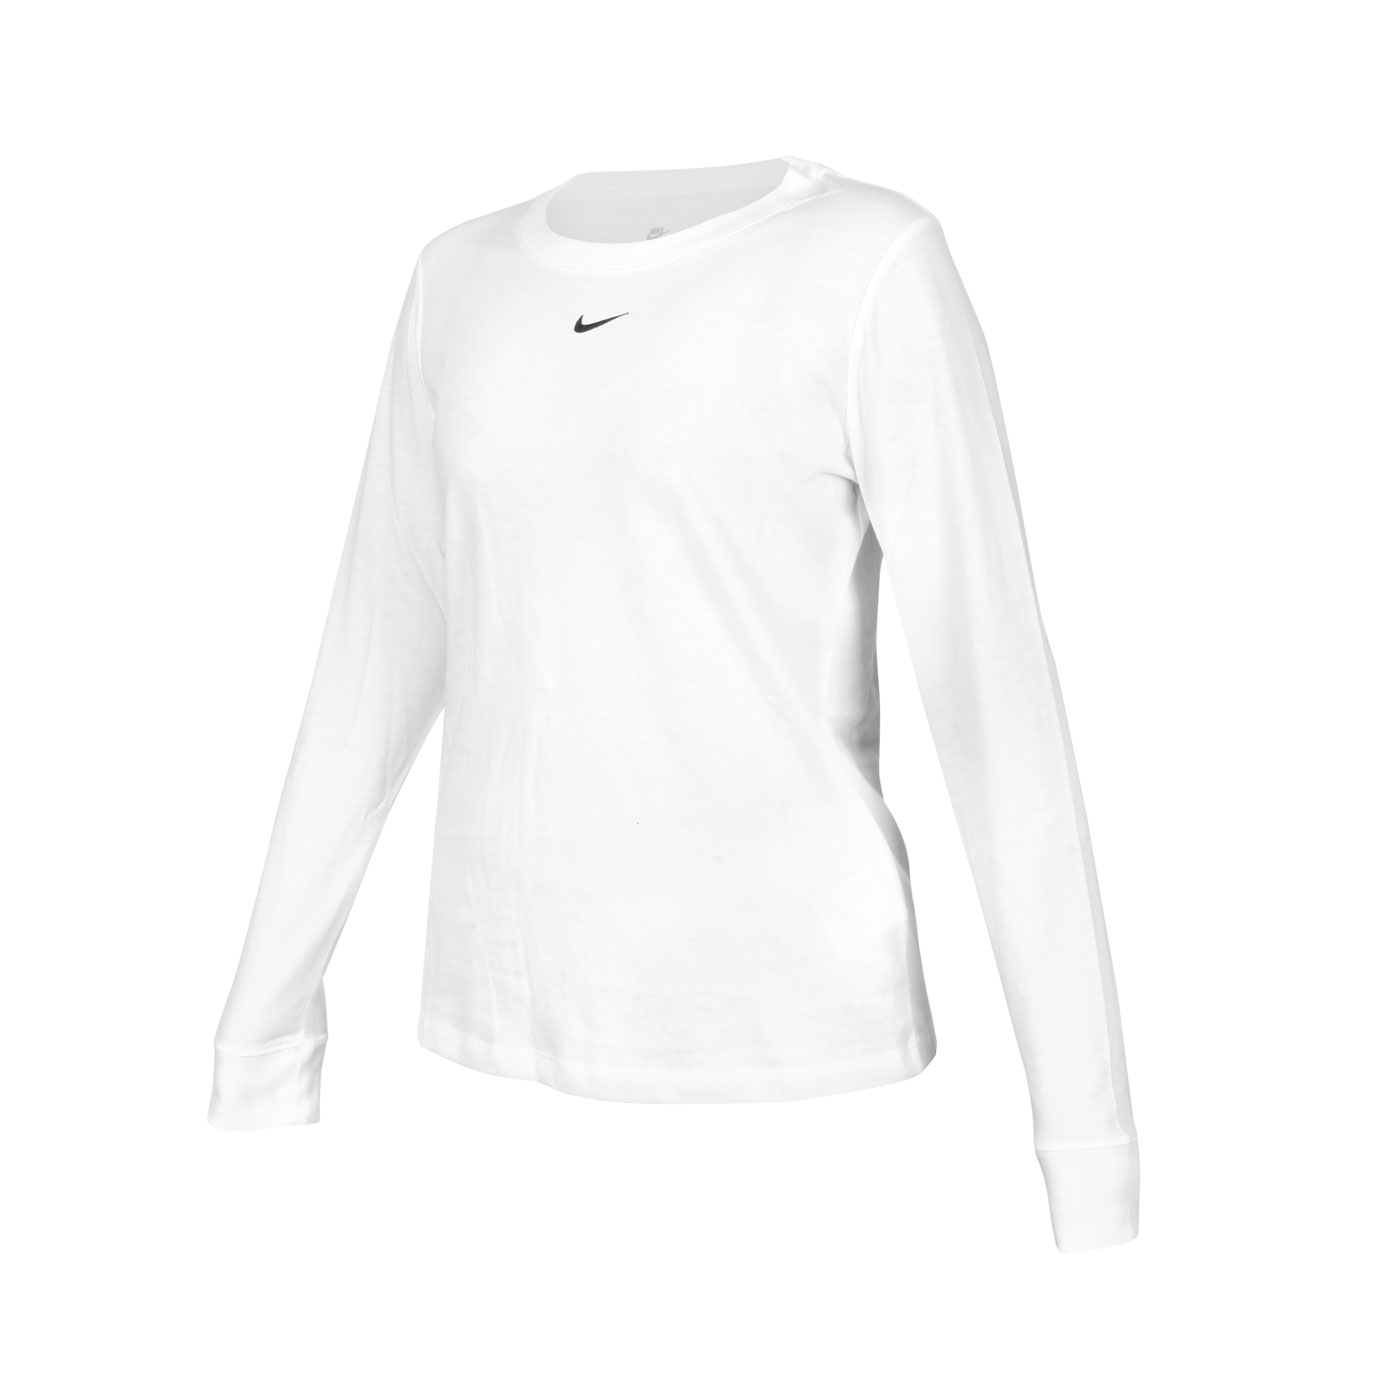 NIKE 女款長袖T恤 DC9834-100